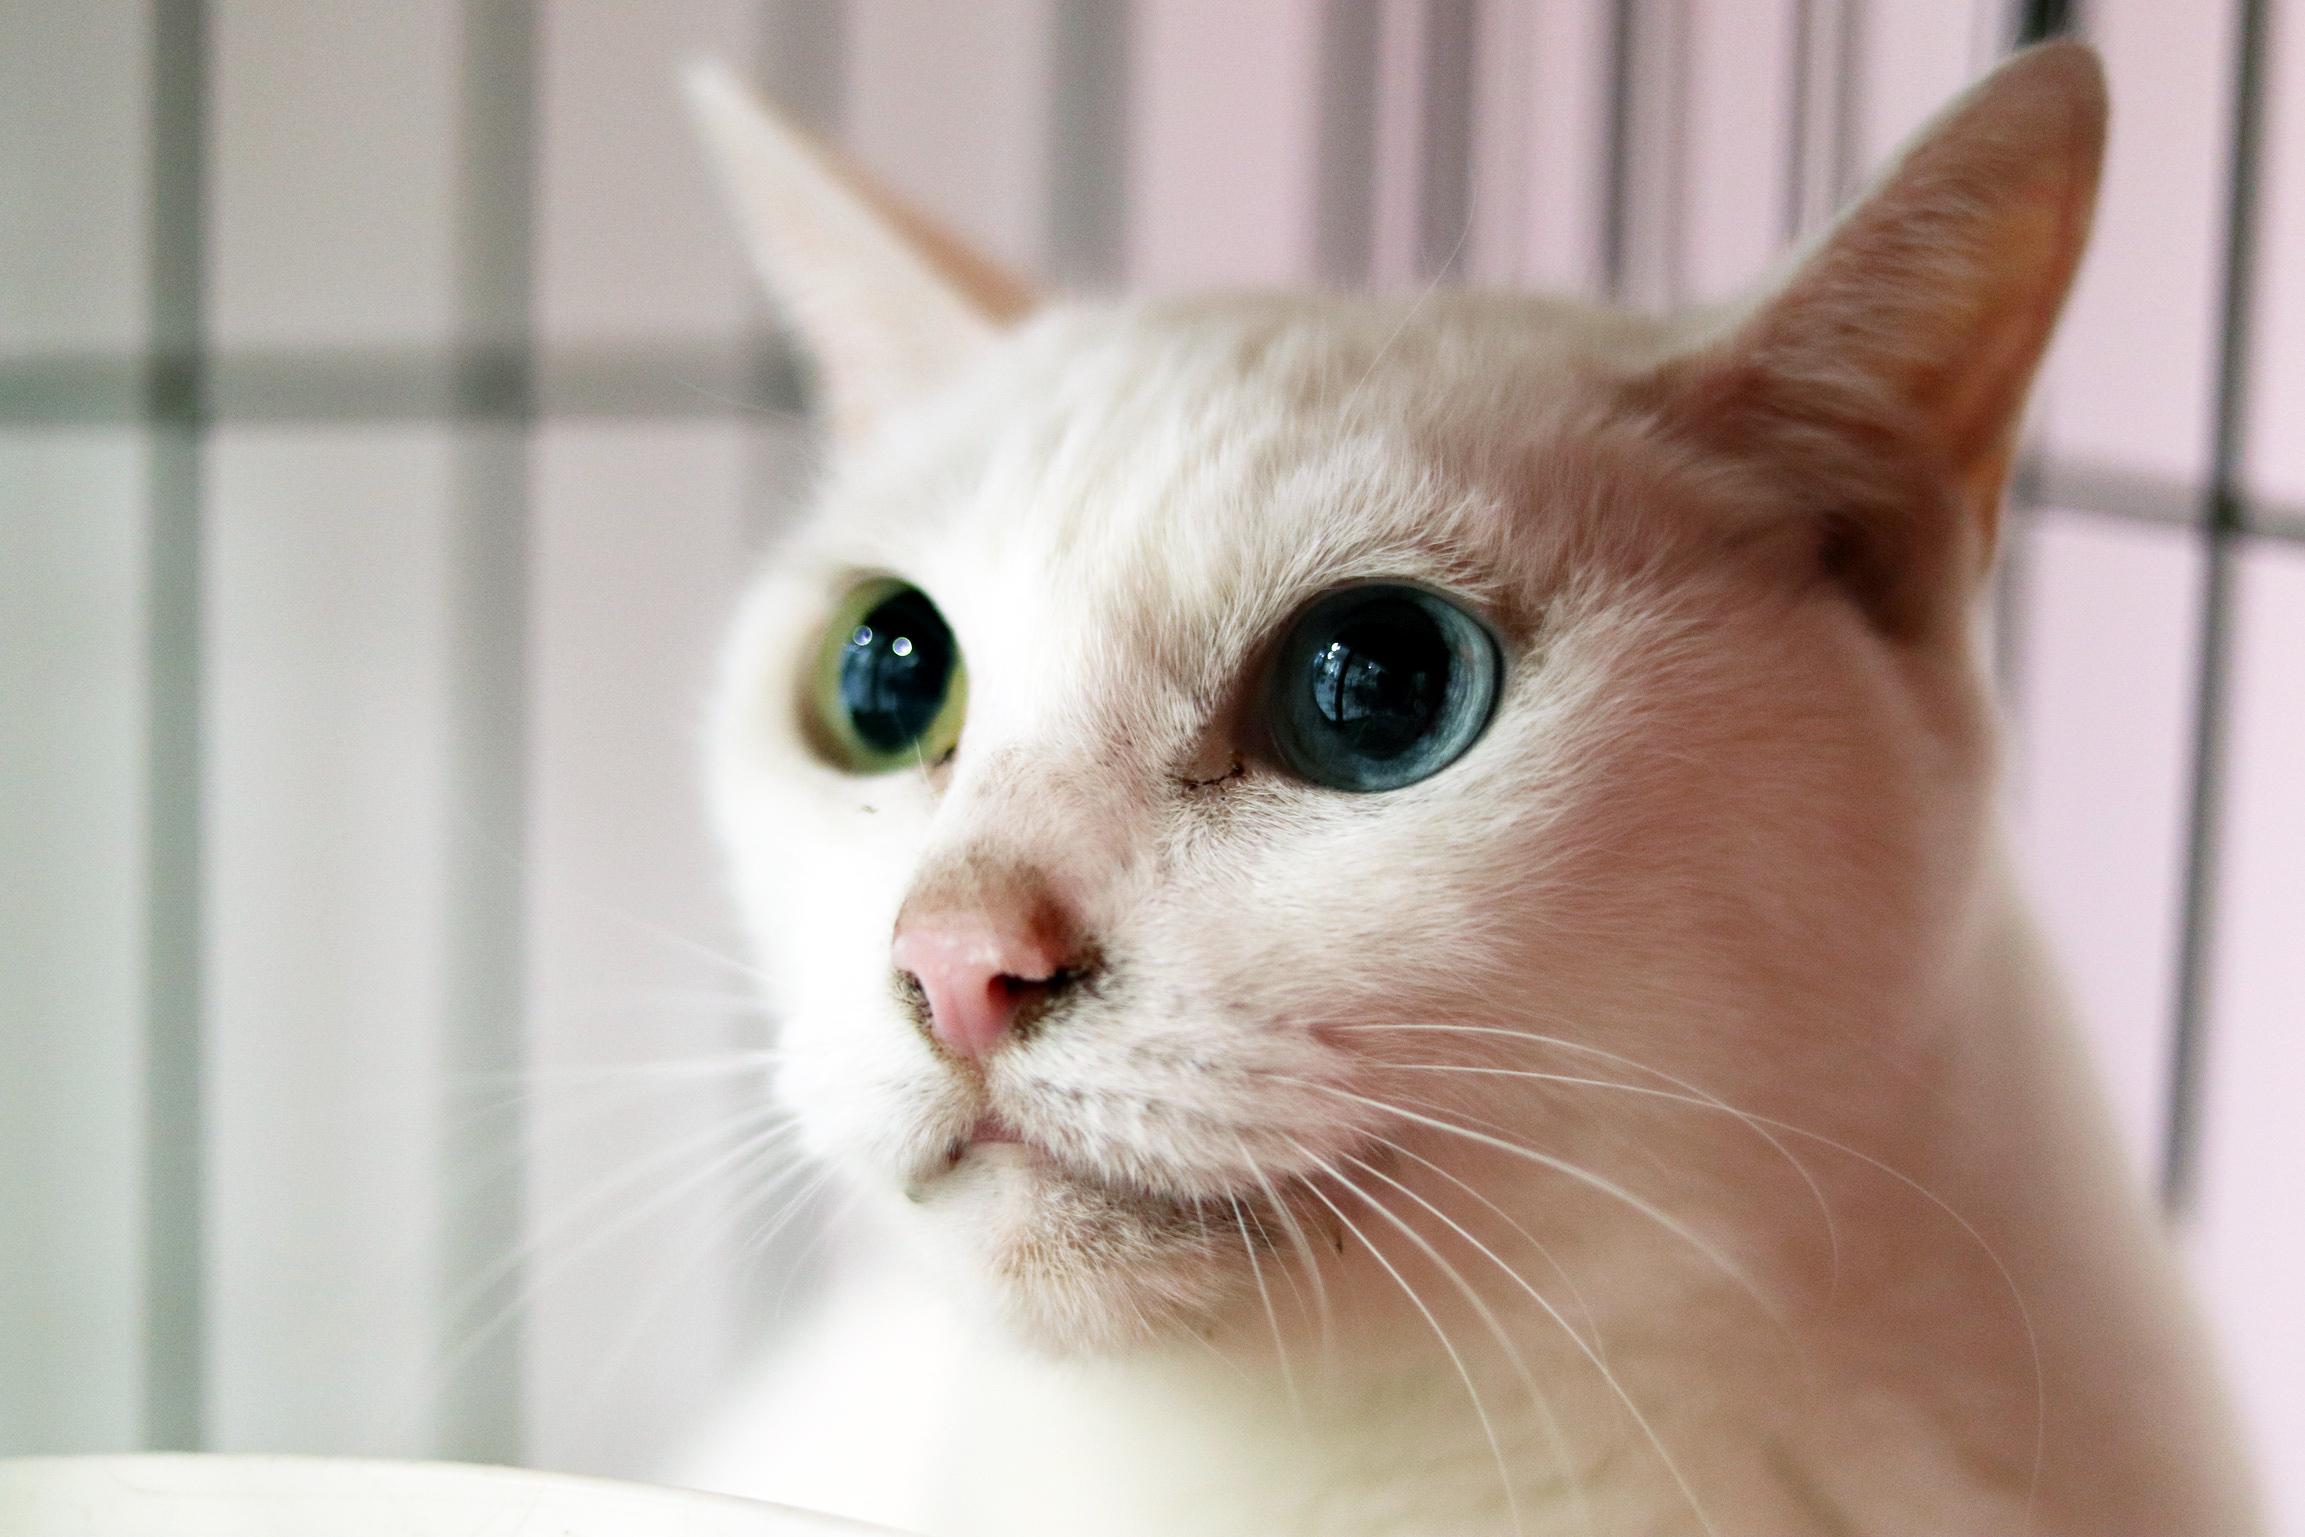 <ul> <li>猫種:日本猫(白)</li> <li>性別:不明</li> <li>名前:名前をつけてあげてね</li> <li>年齢:2010年頃生まれ</li> <li>保護経緯:高齢の飼い主が逝去し、親族も引き継ぐことが出来ず飼育困難</li> </ul>